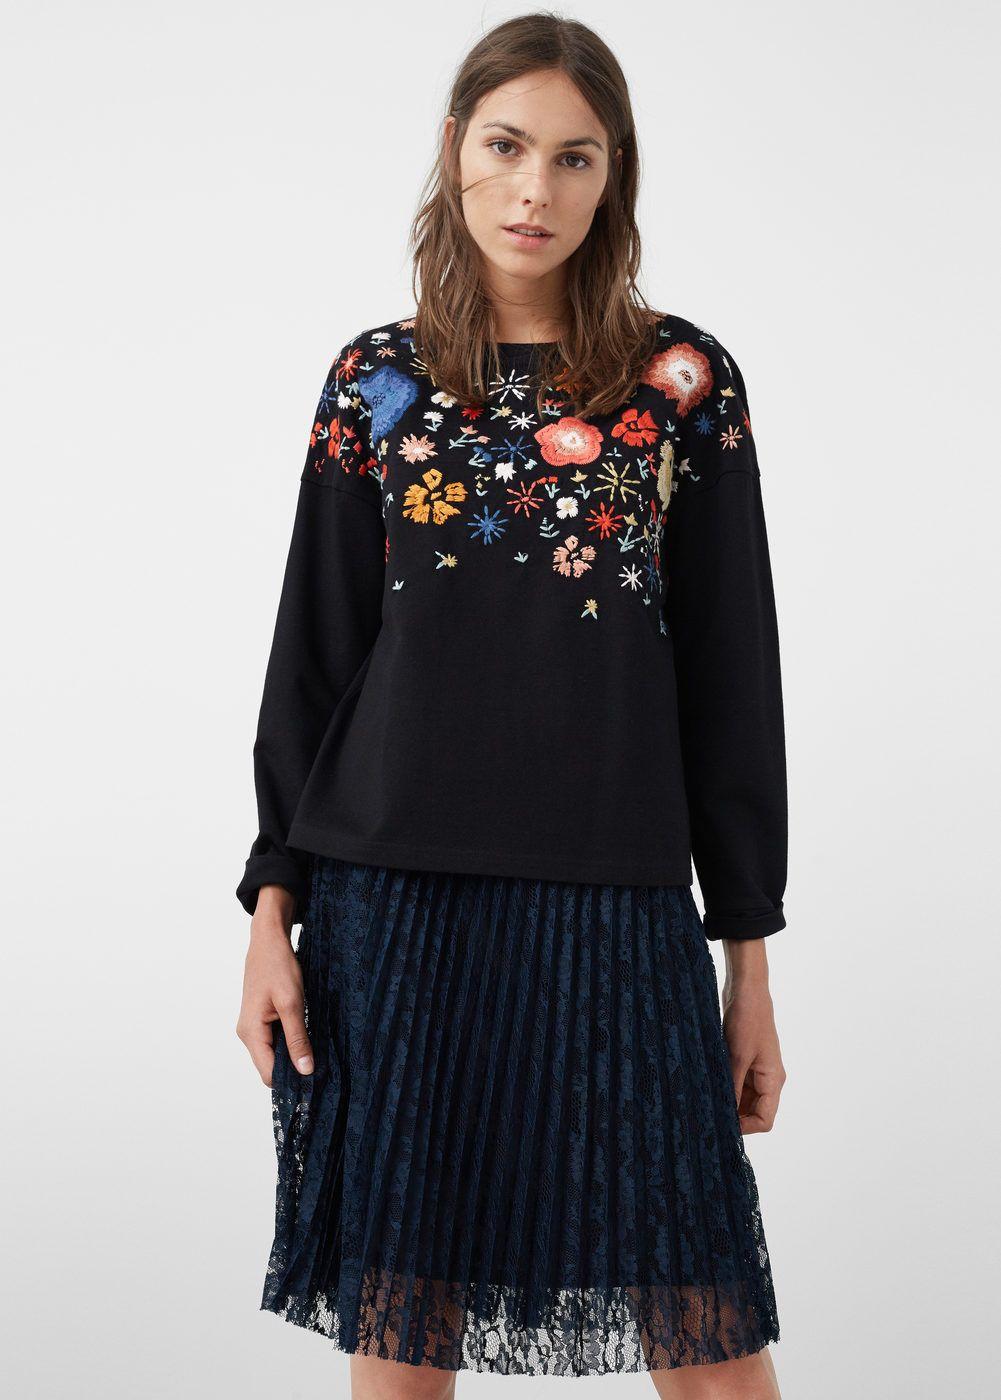 Mango elegante kleider